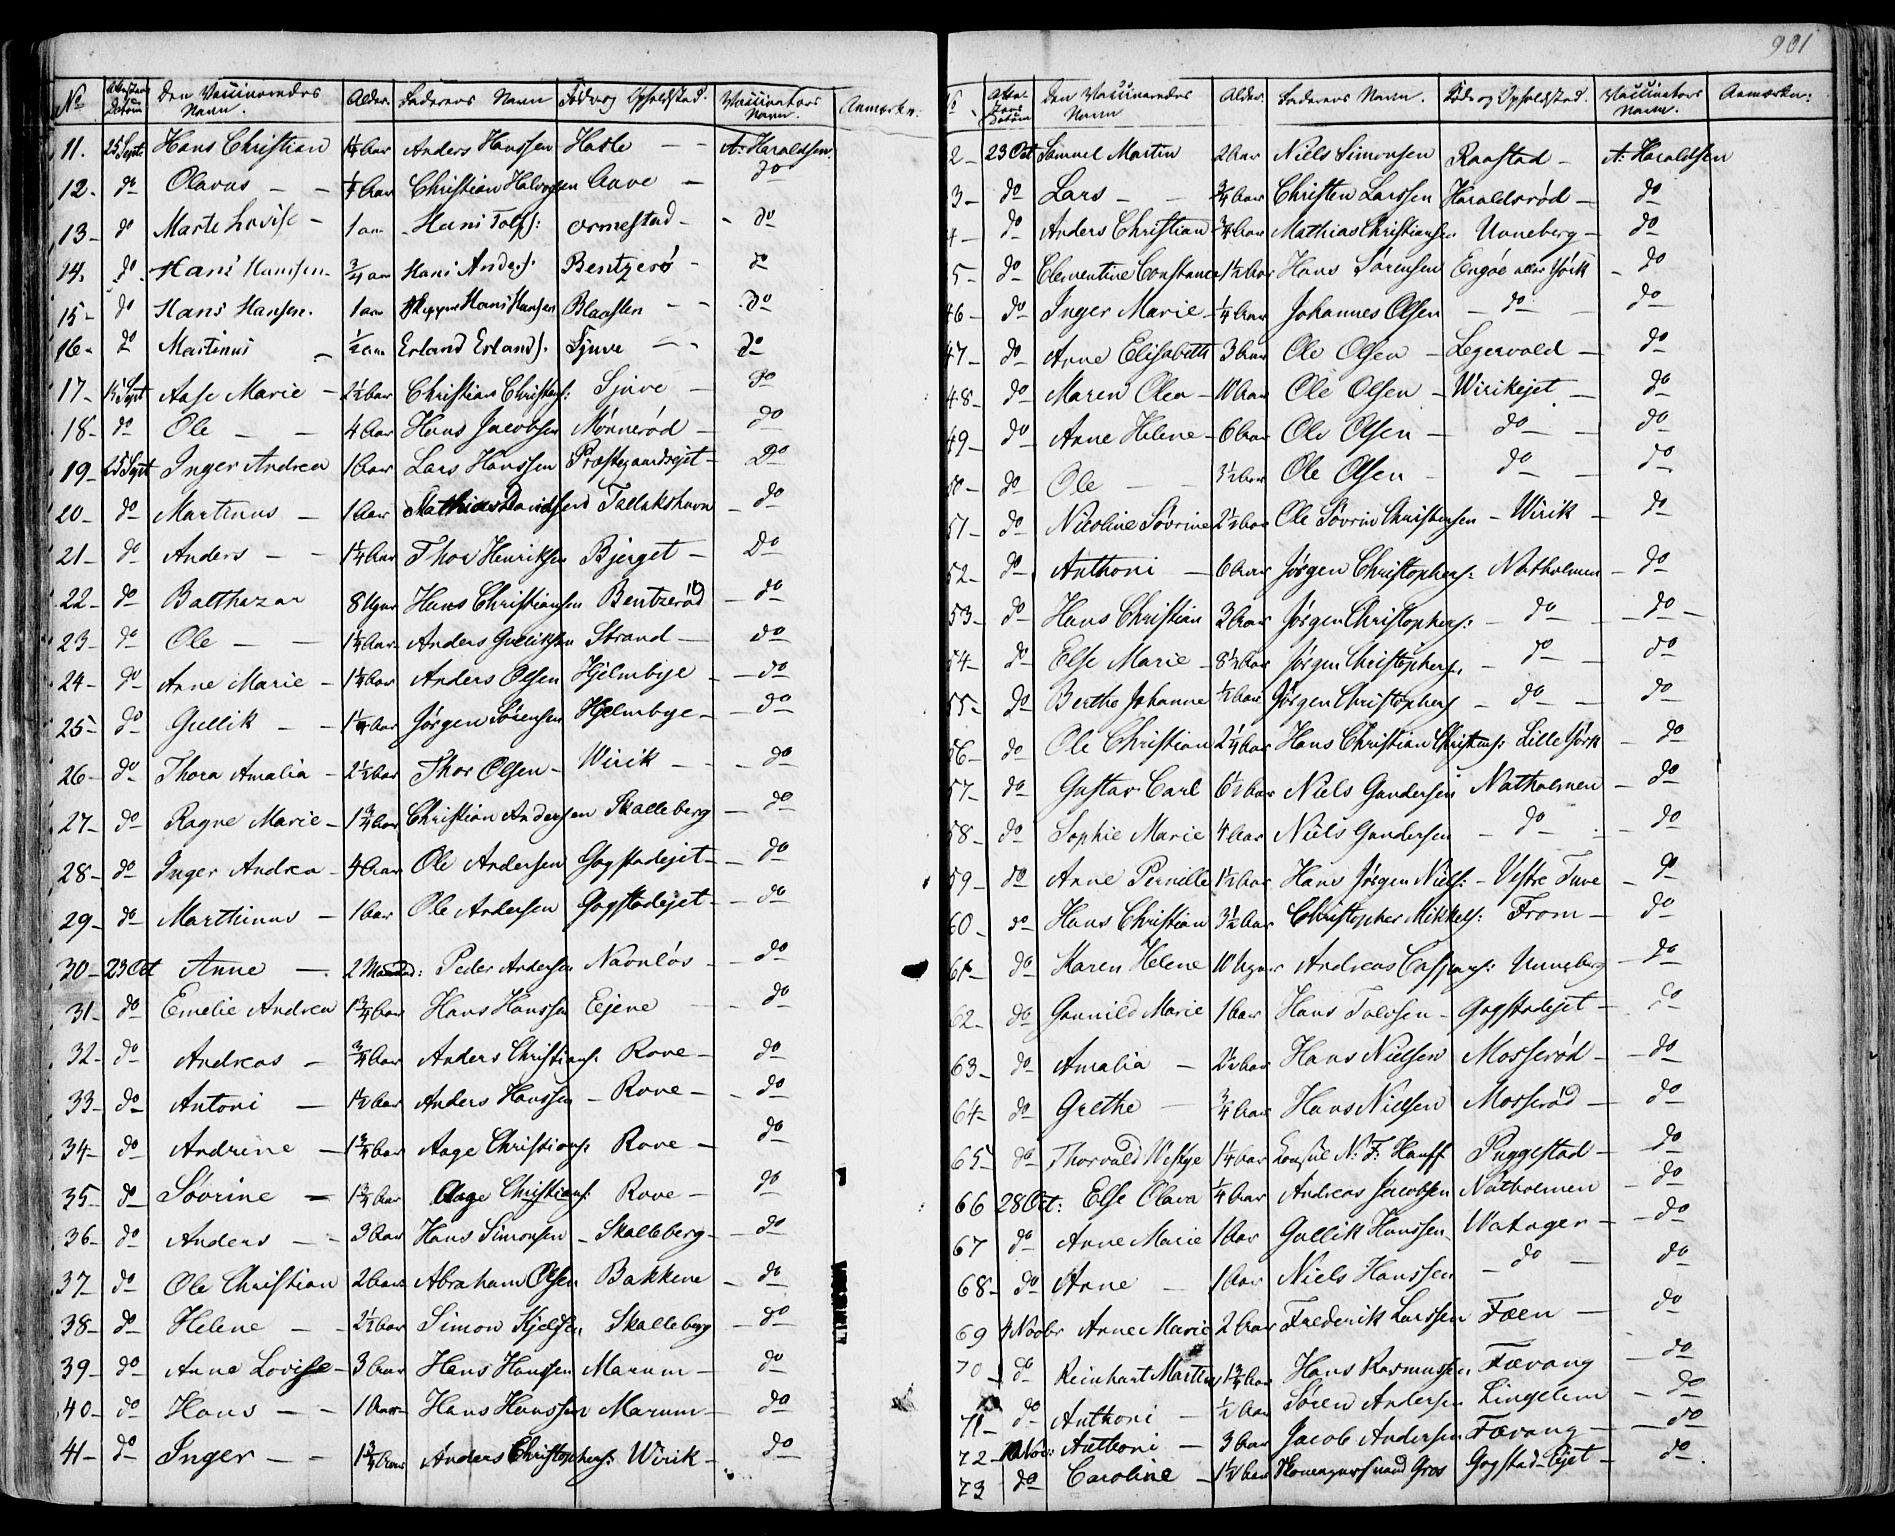 SAKO, Sandar kirkebøker, F/Fa/L0005: Parish register (official) no. 5, 1832-1847, p. 900-901